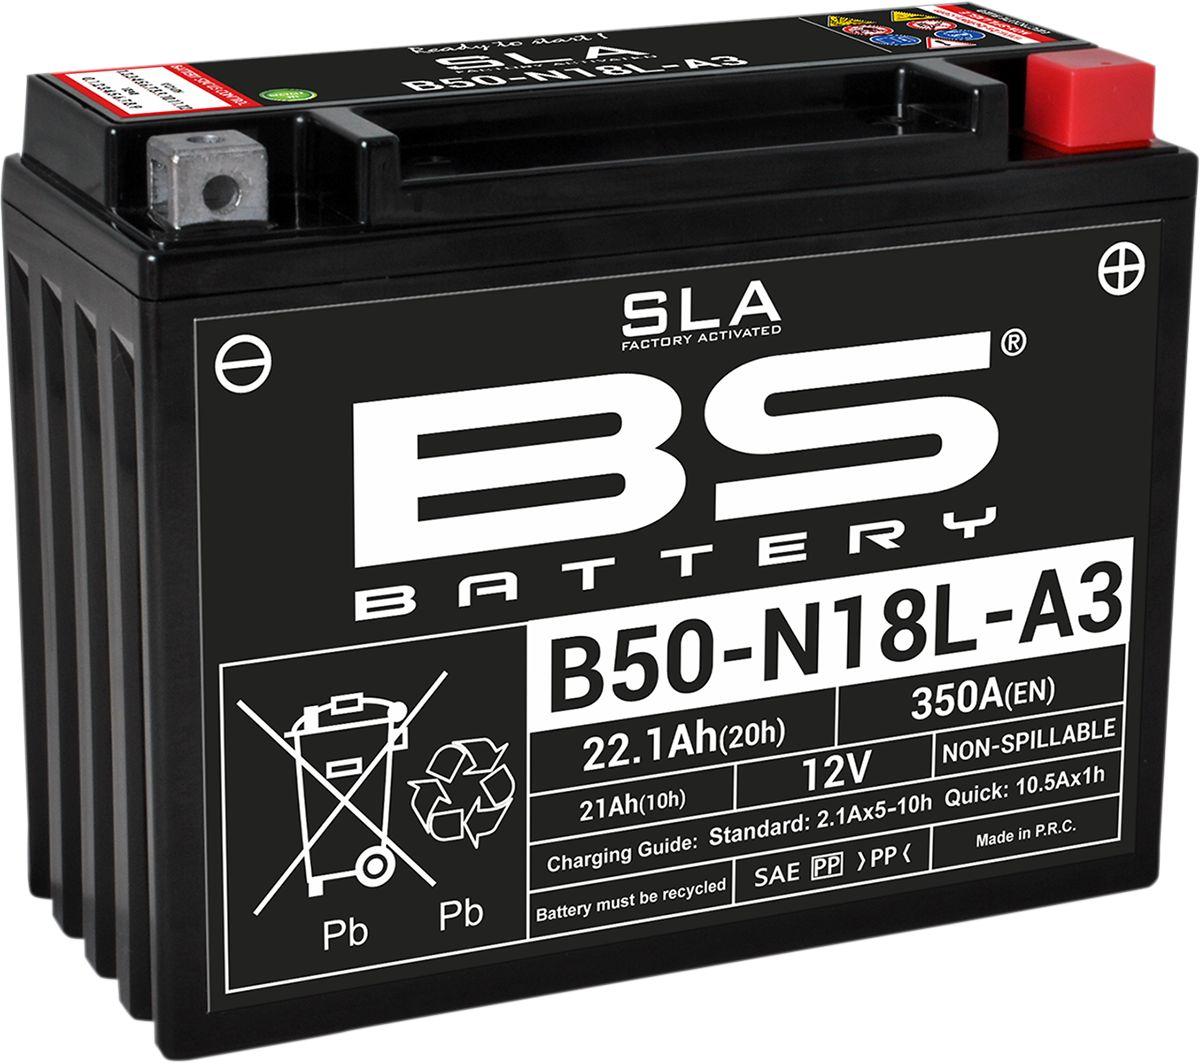 BATTERY BS B50N18L-A3 SLA